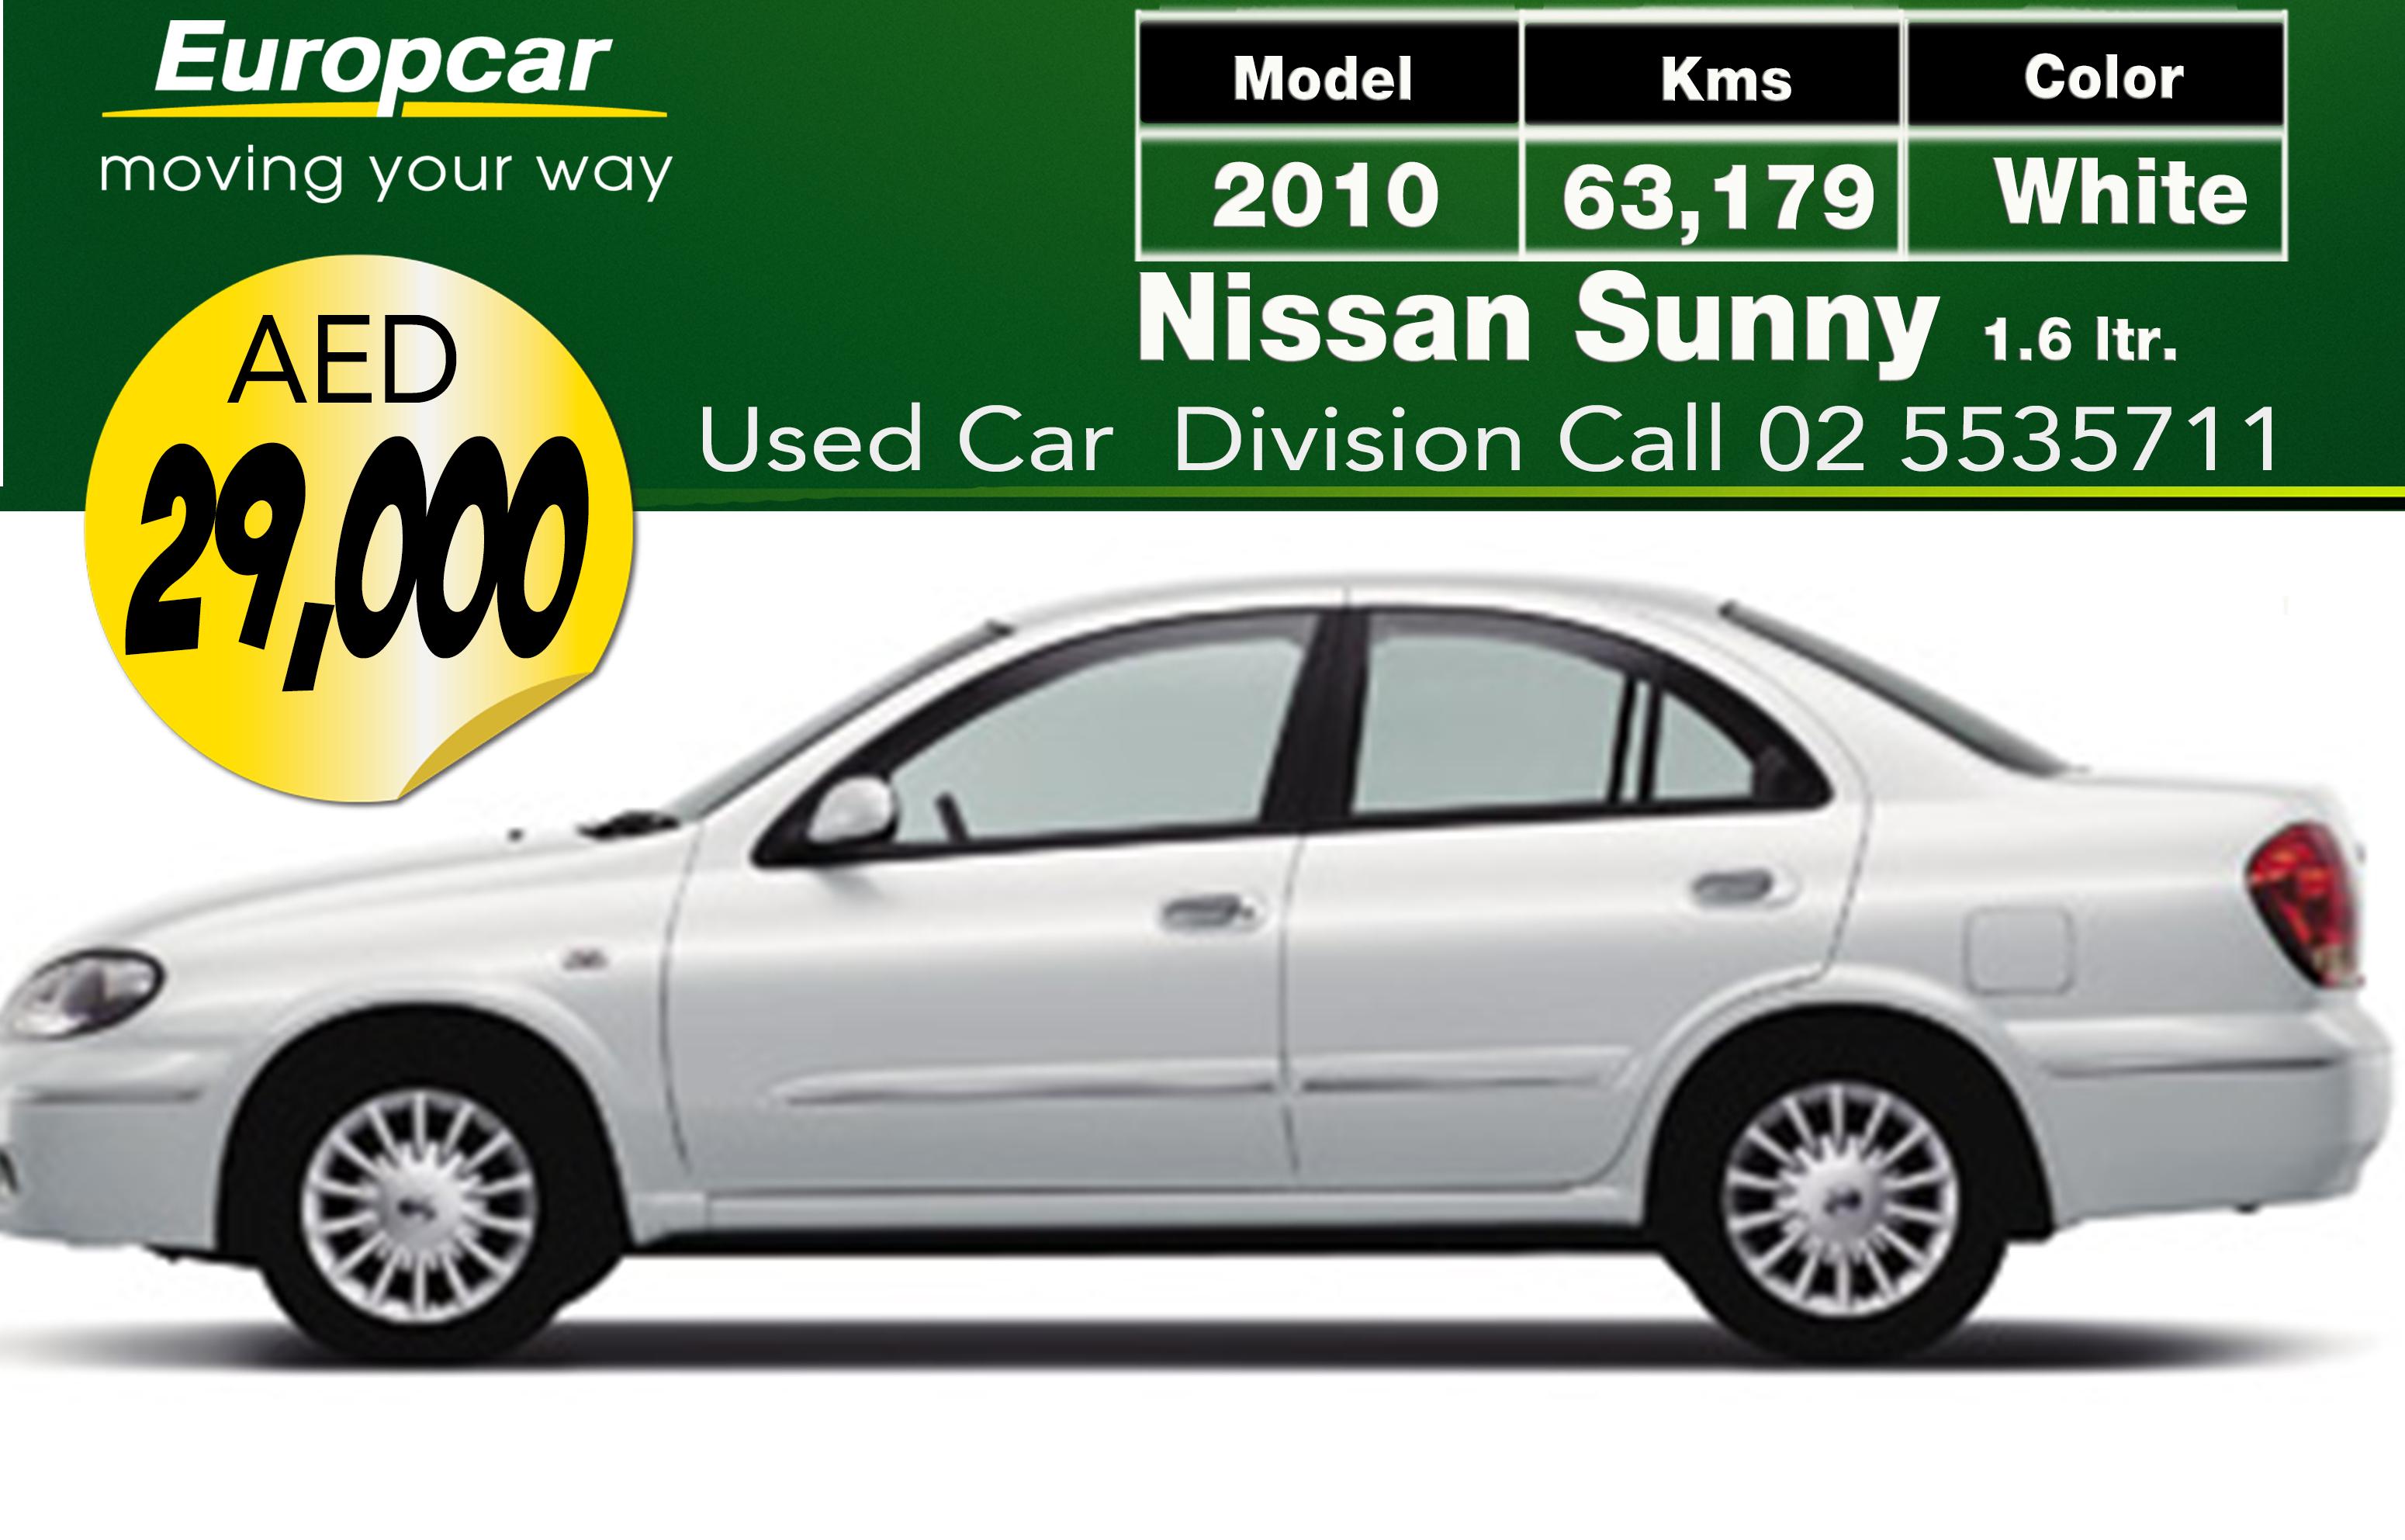 Europcar Abu Dhabi Used Car Nissan Sunny